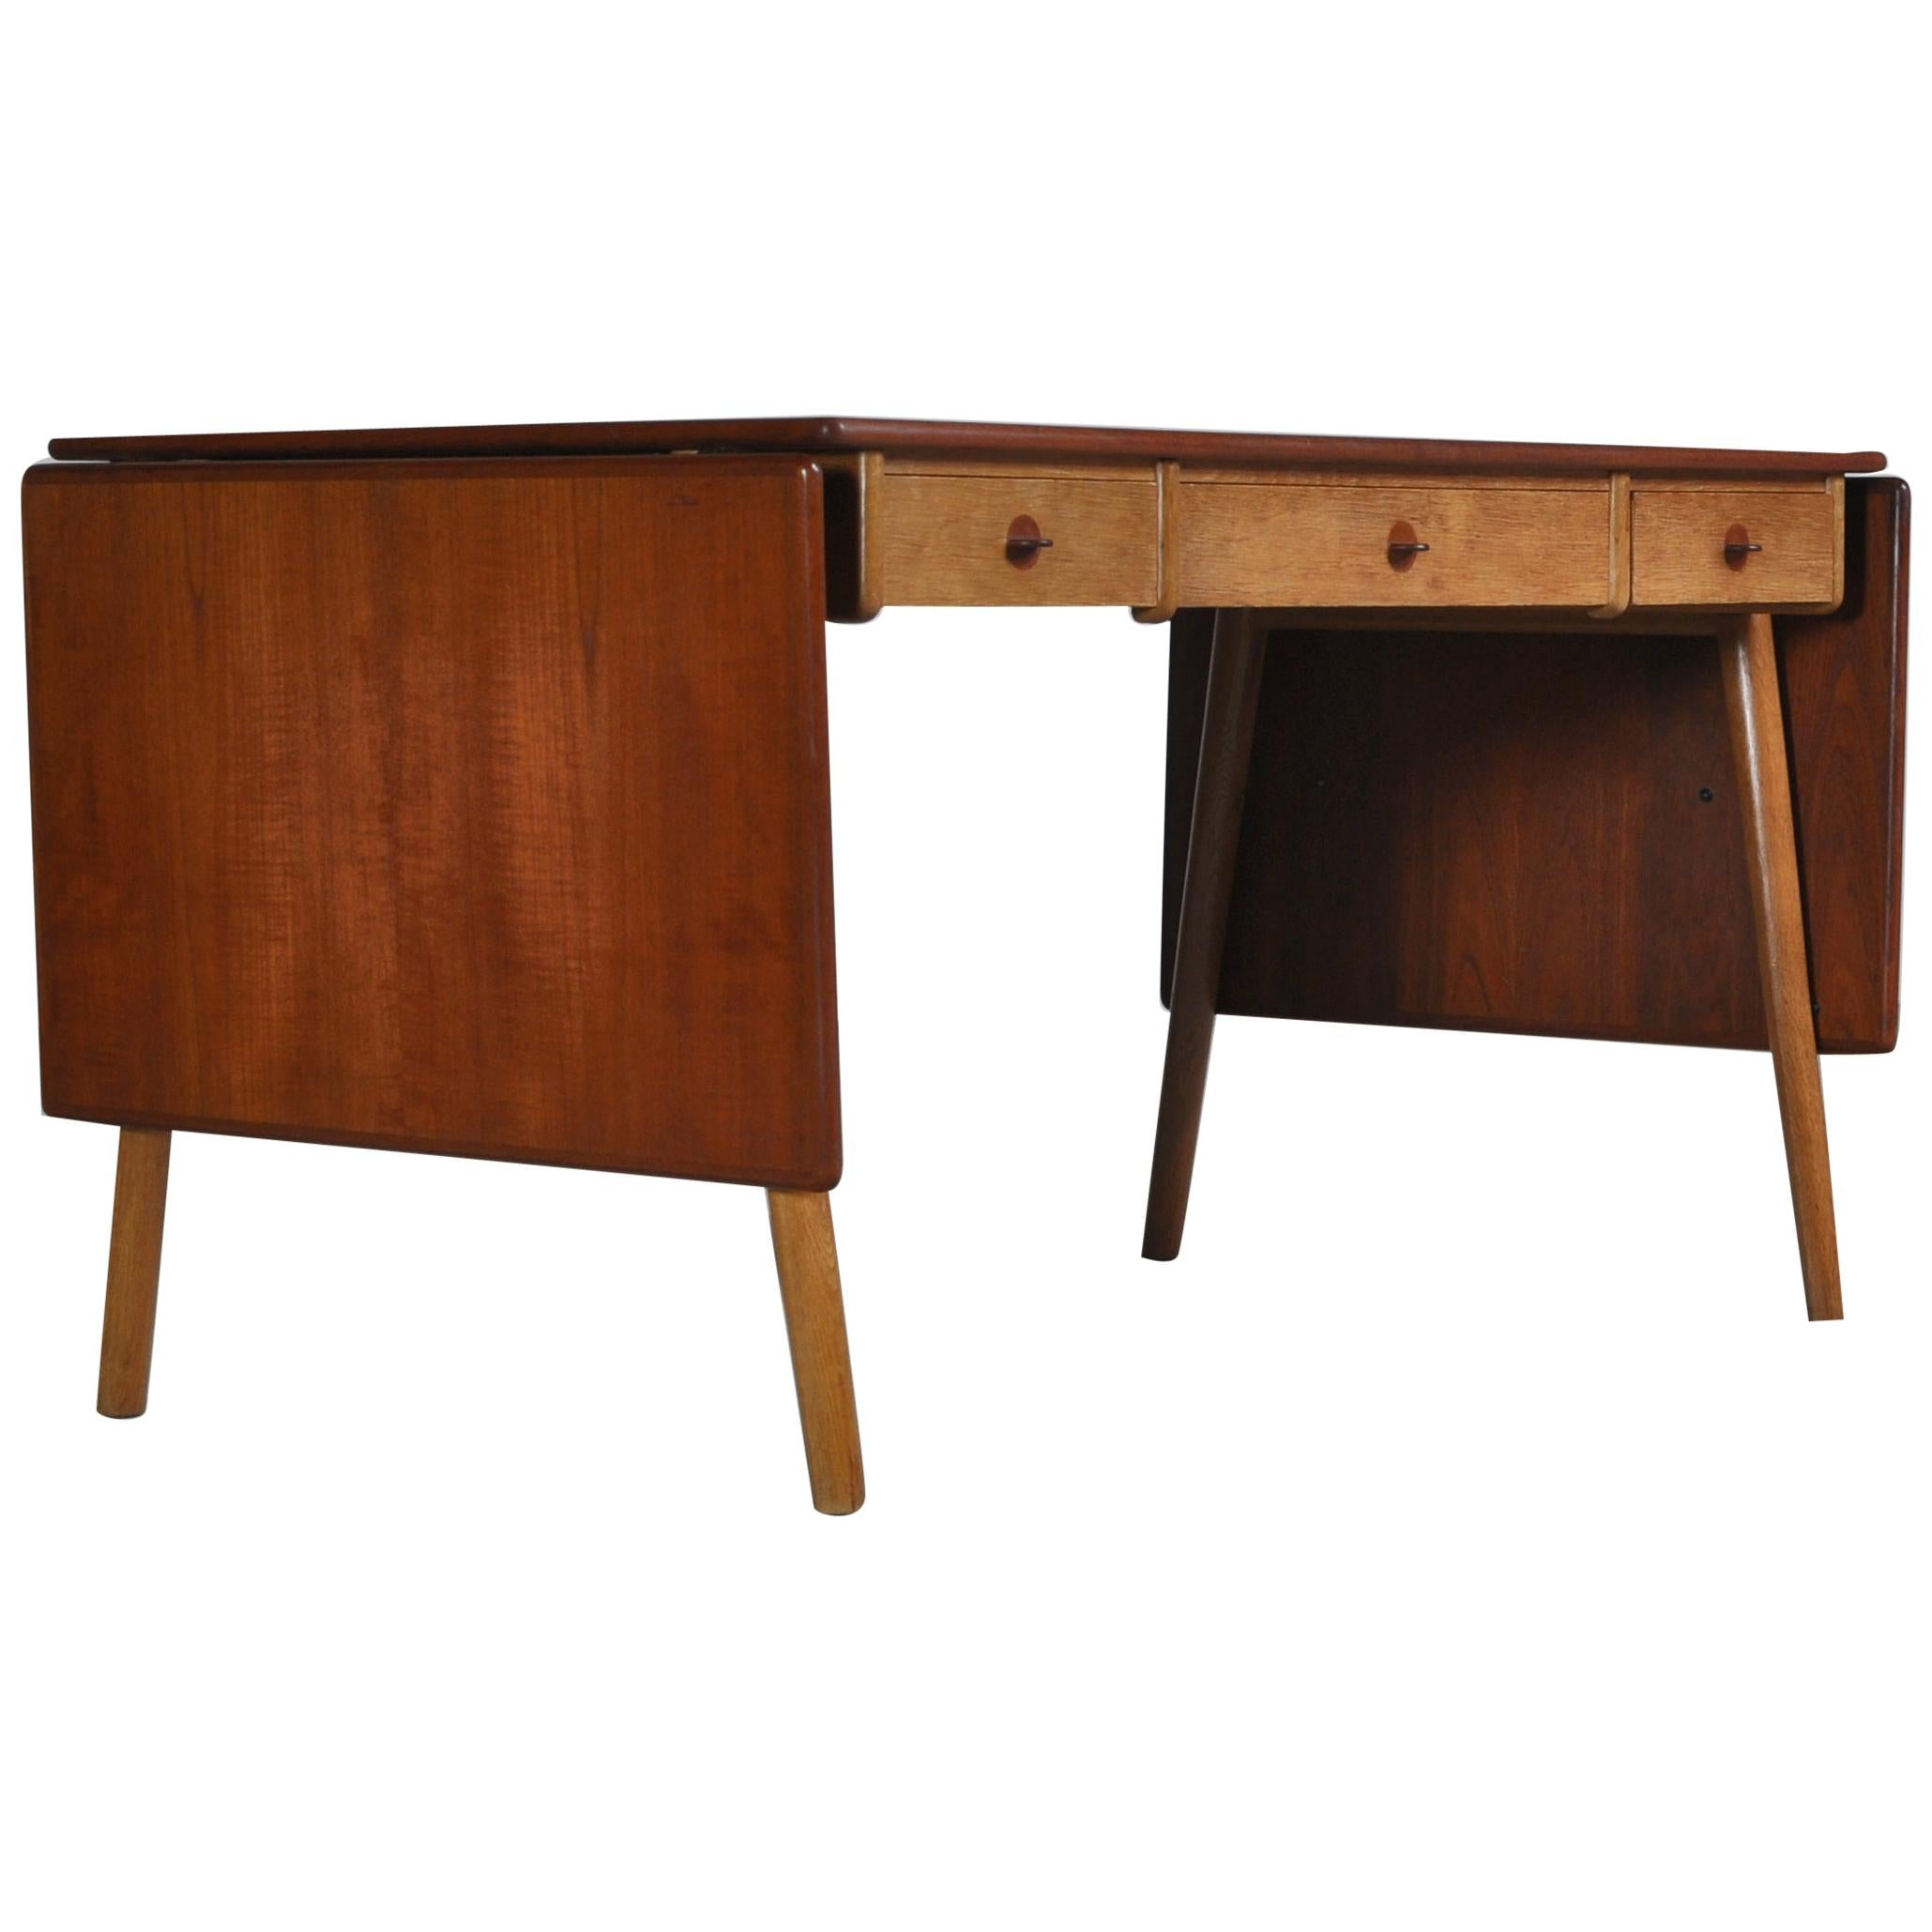 "Danish Modern Oak & Teakwood Desk ""Model 158"" by Poul Volther, 1957"